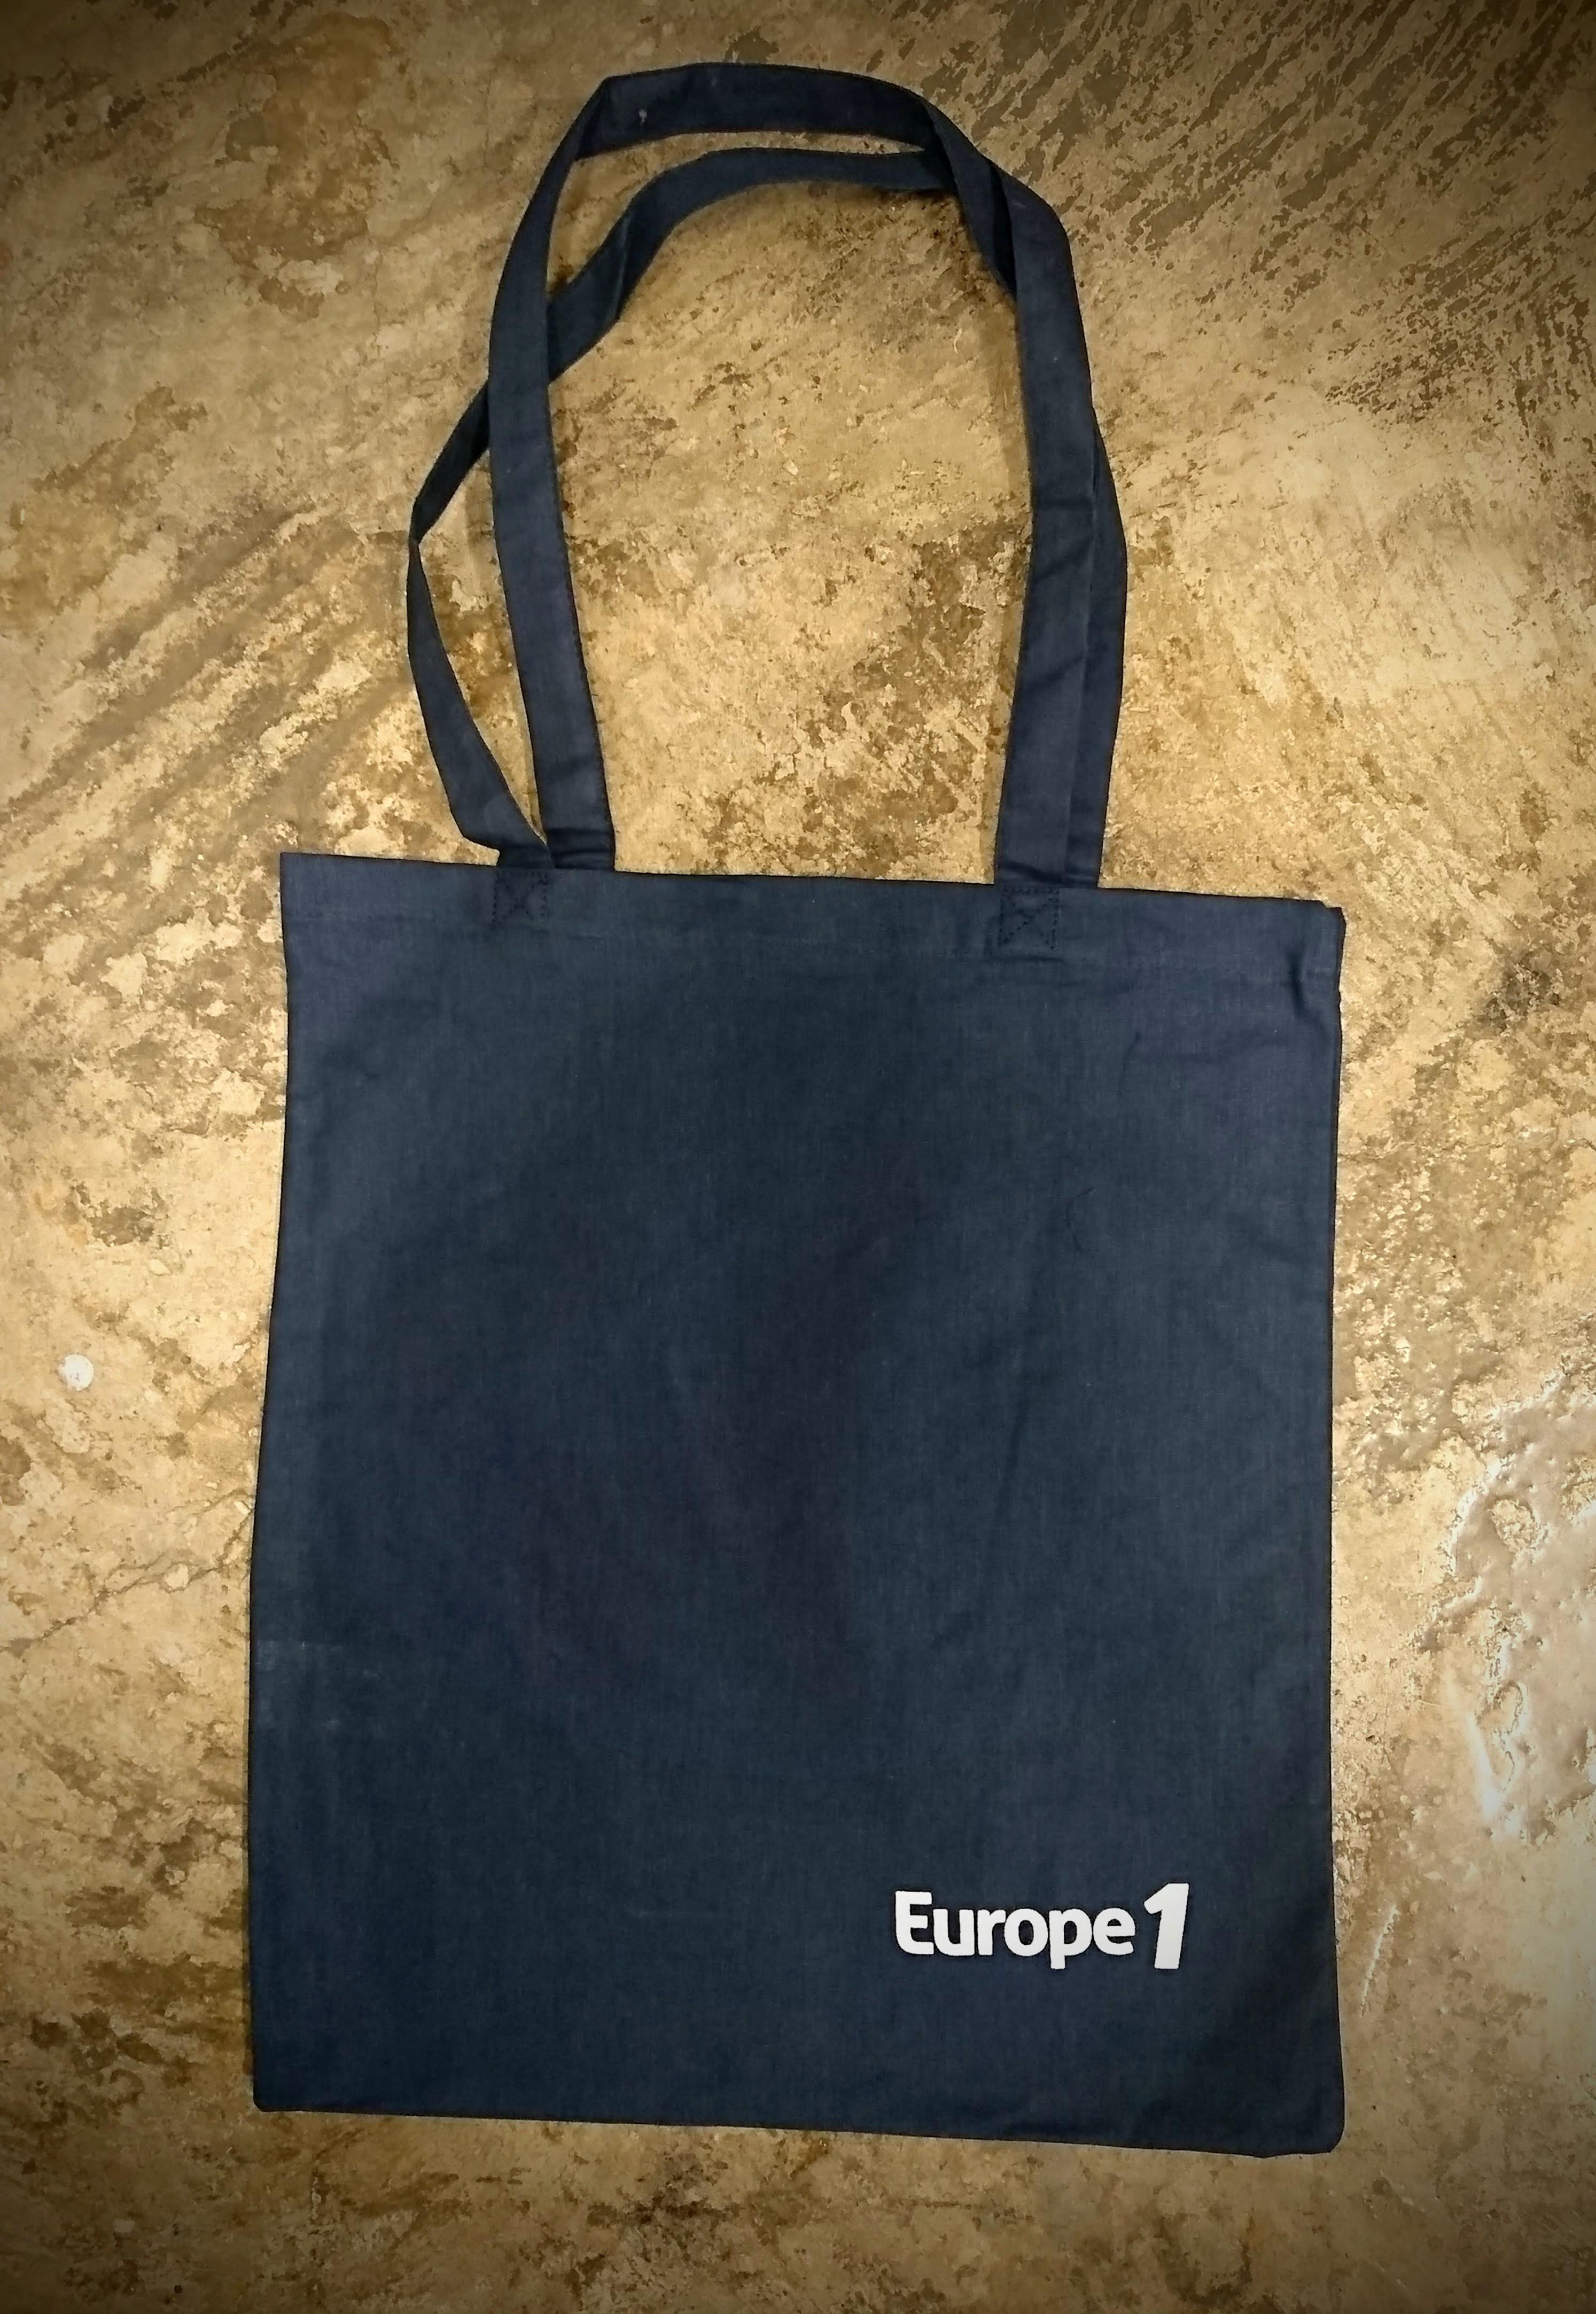 tote bag personnalisé europe 1 efficio serigraphie aloha